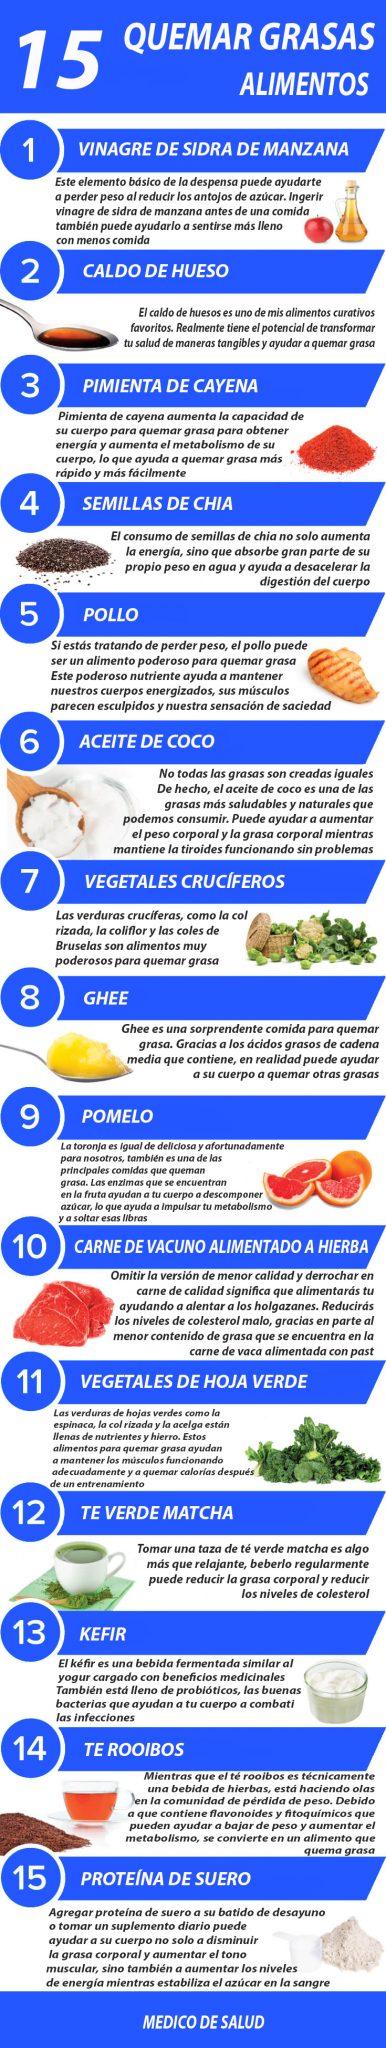 15 Alimentos para Quemar Grasa 15 alimentos para quemar grasa 15 Alimentos para Quemar Grasa 15 Alimentos para Quemar Grasa